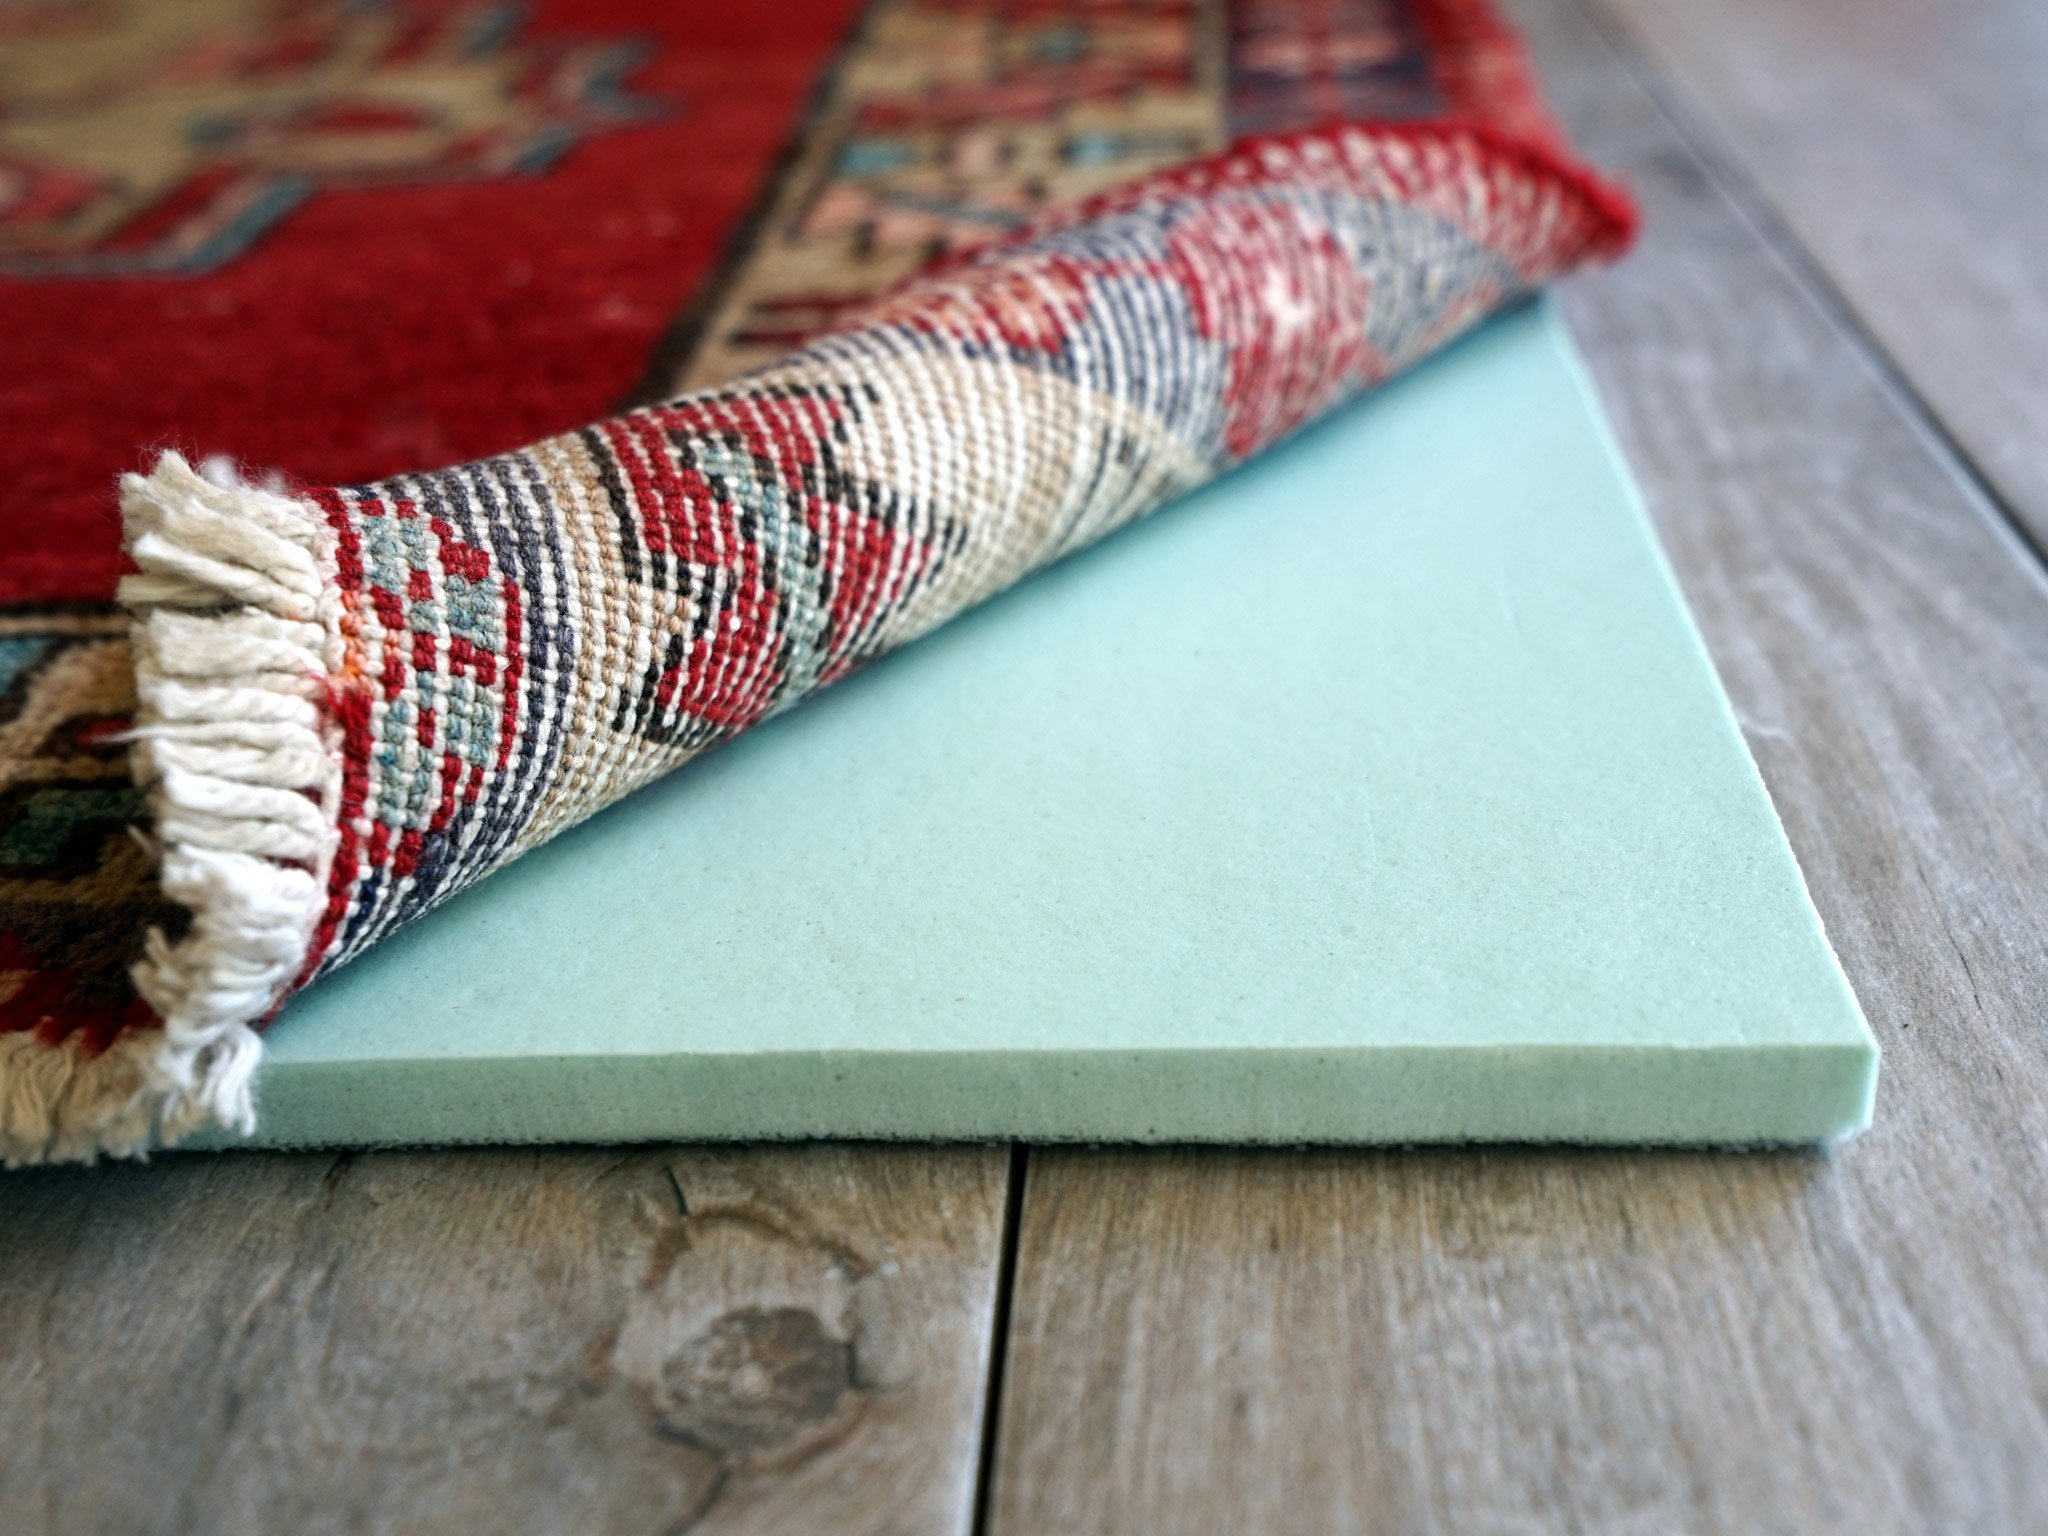 Cloud Comfort 7 16 Rugs Sound Proofing Vinyl Plank Flooring